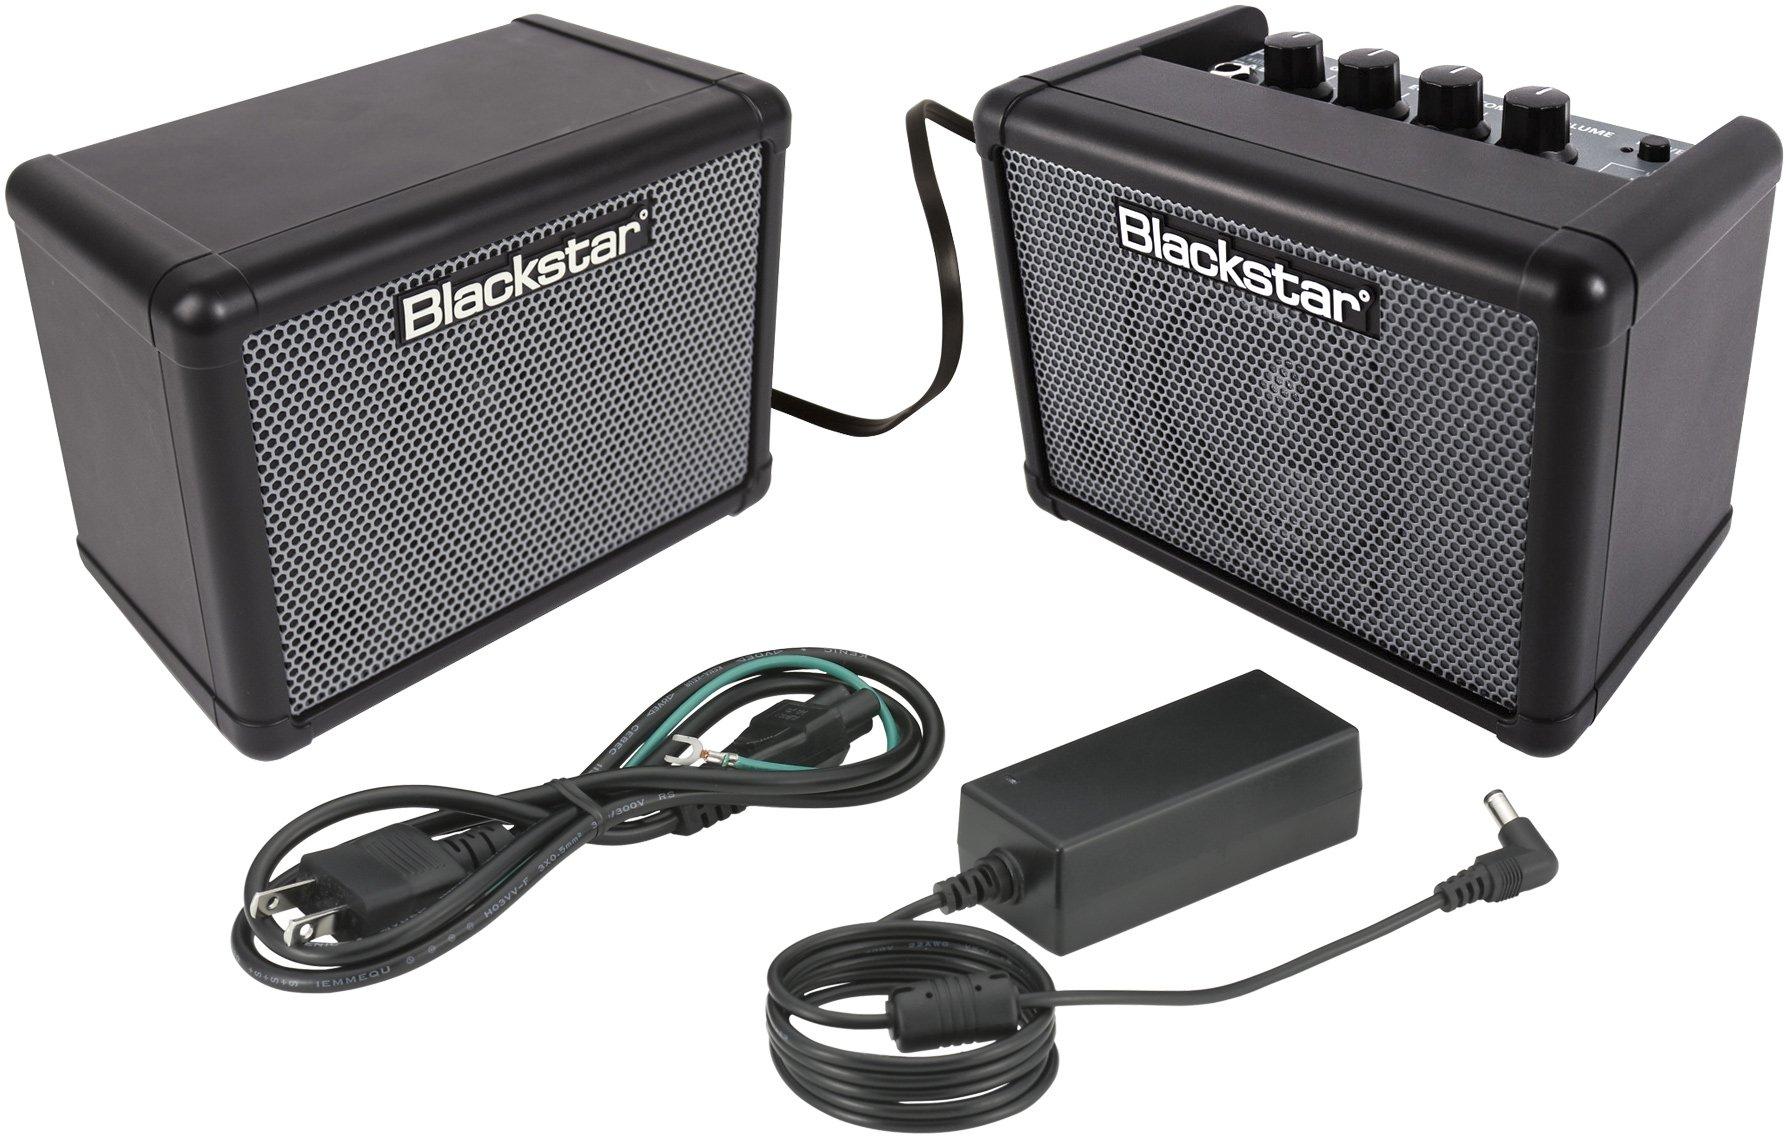 Blackstar Fly 3 Bass Pak Stereo Pack (FLY3BASSPAK) by Blackstar